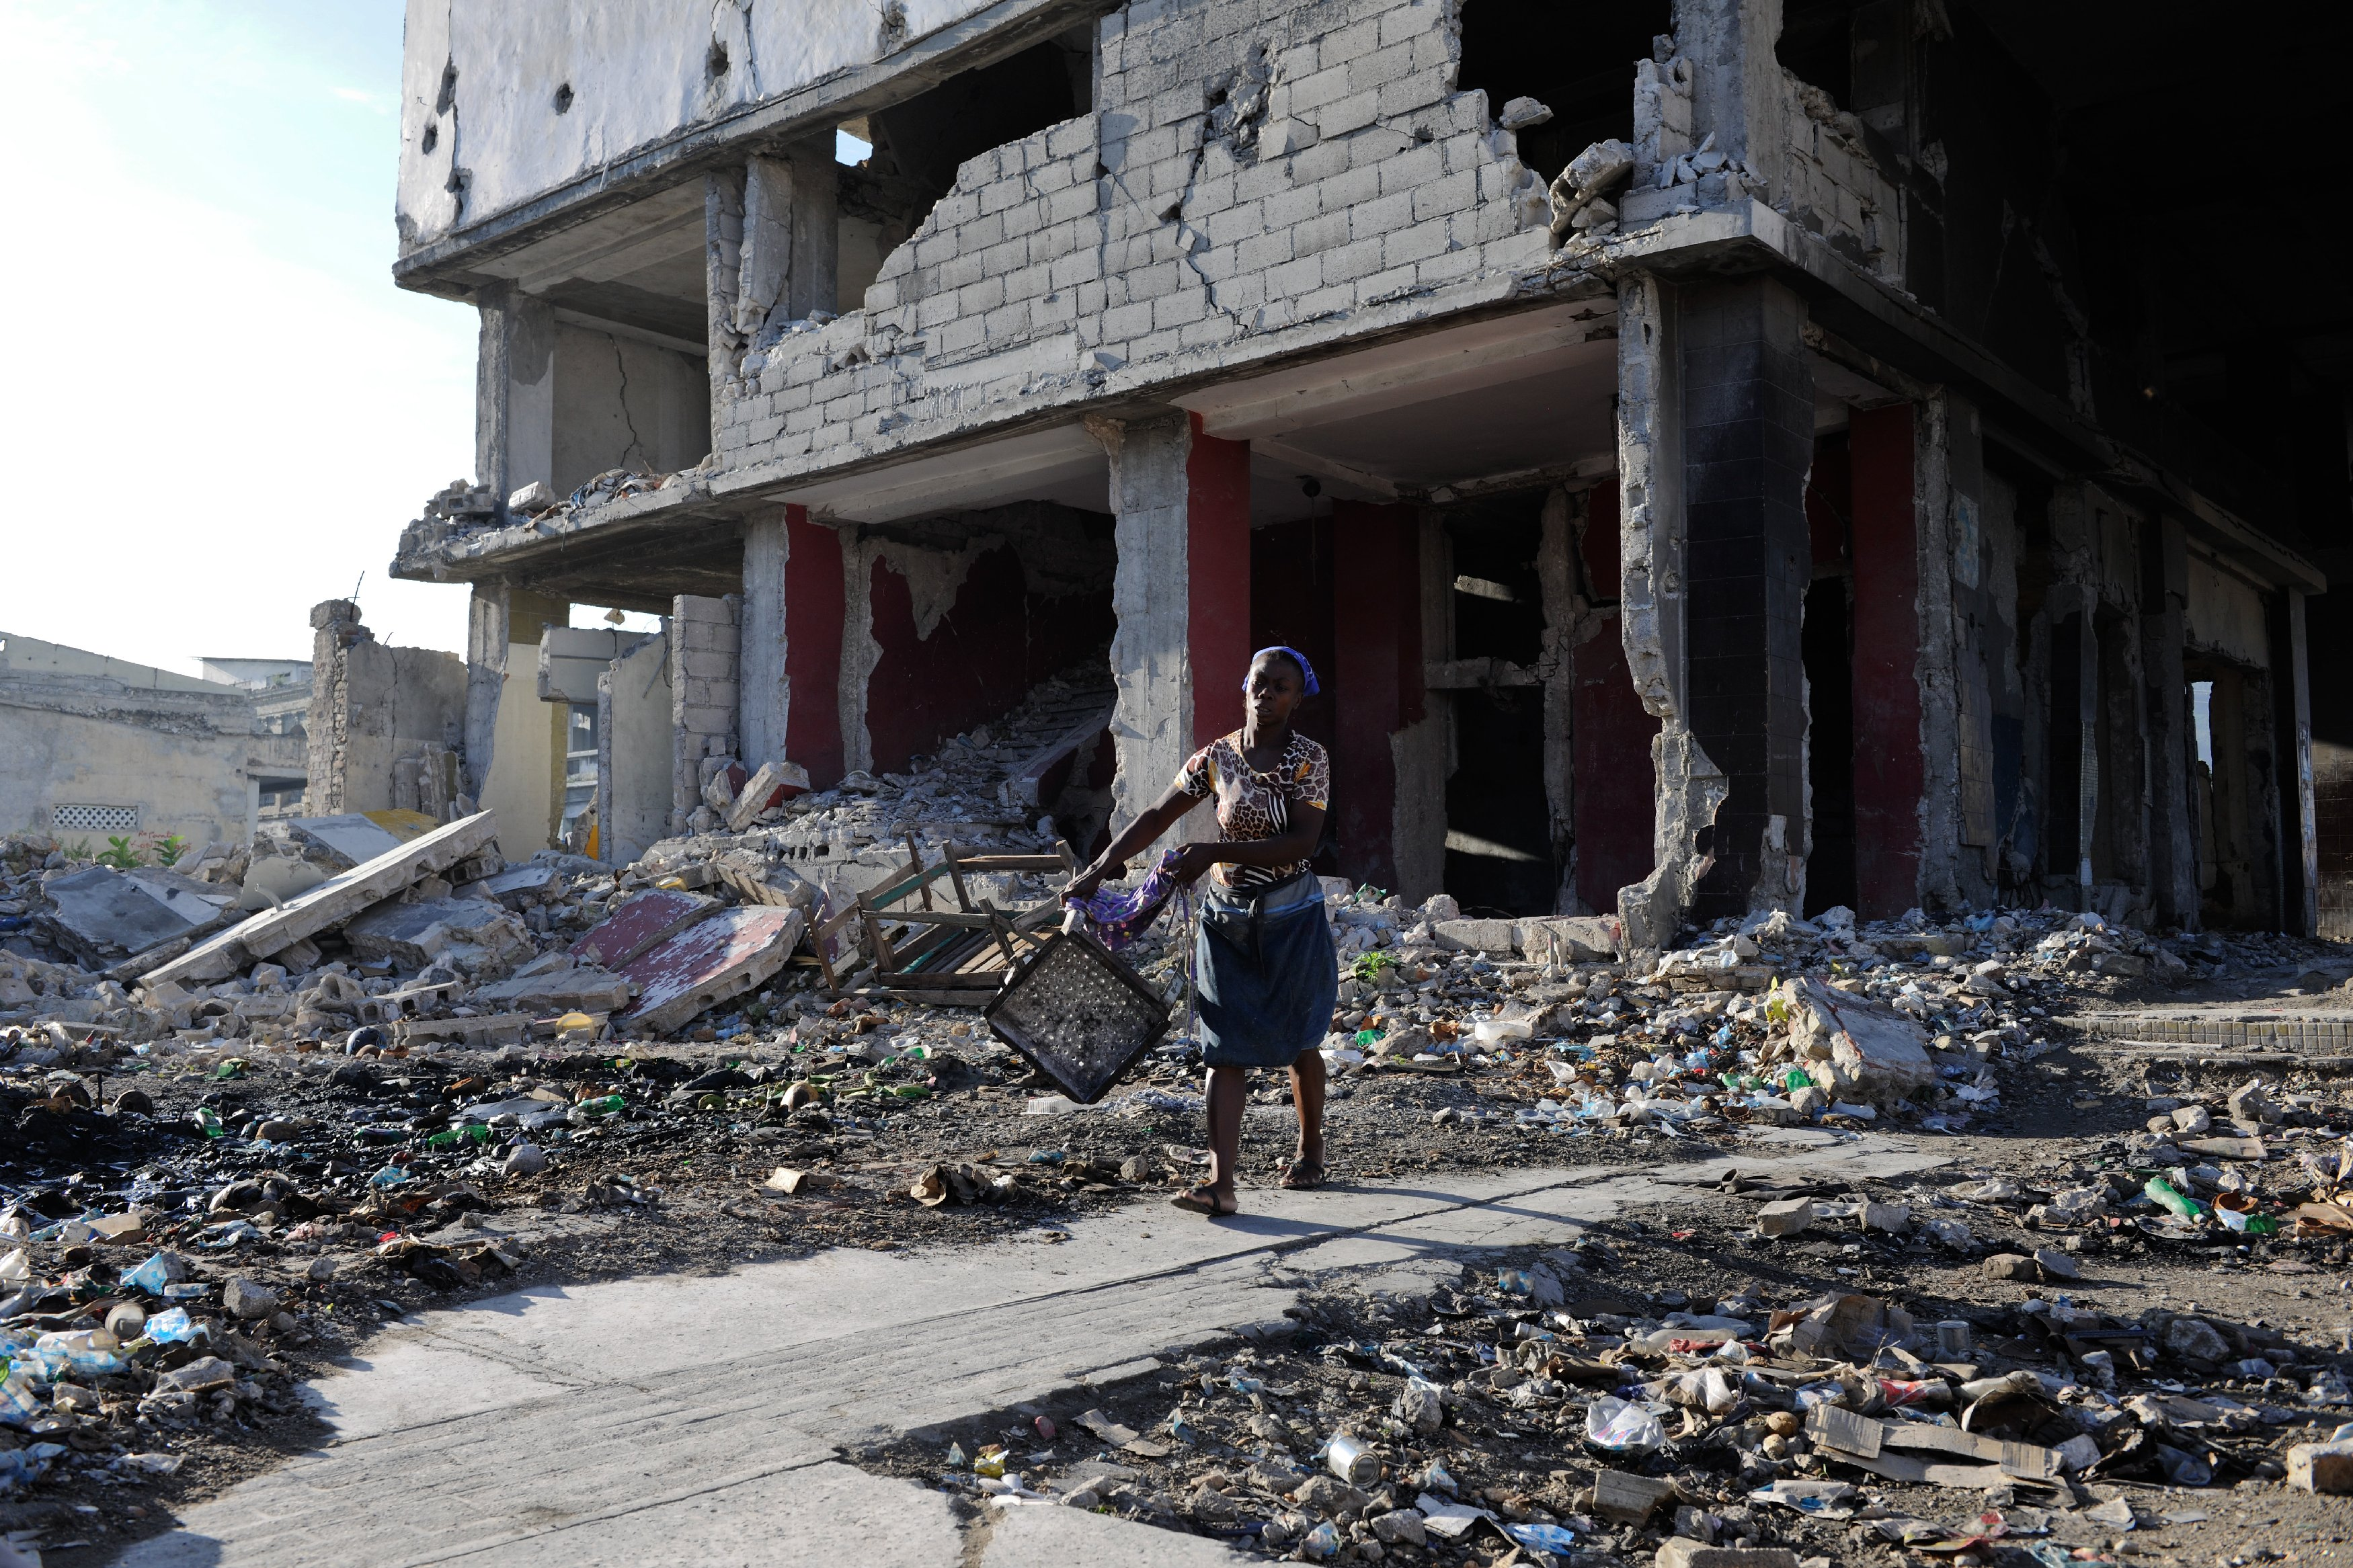 Столица Гаити Порт-о-Пренсе. Последствия землетрясения